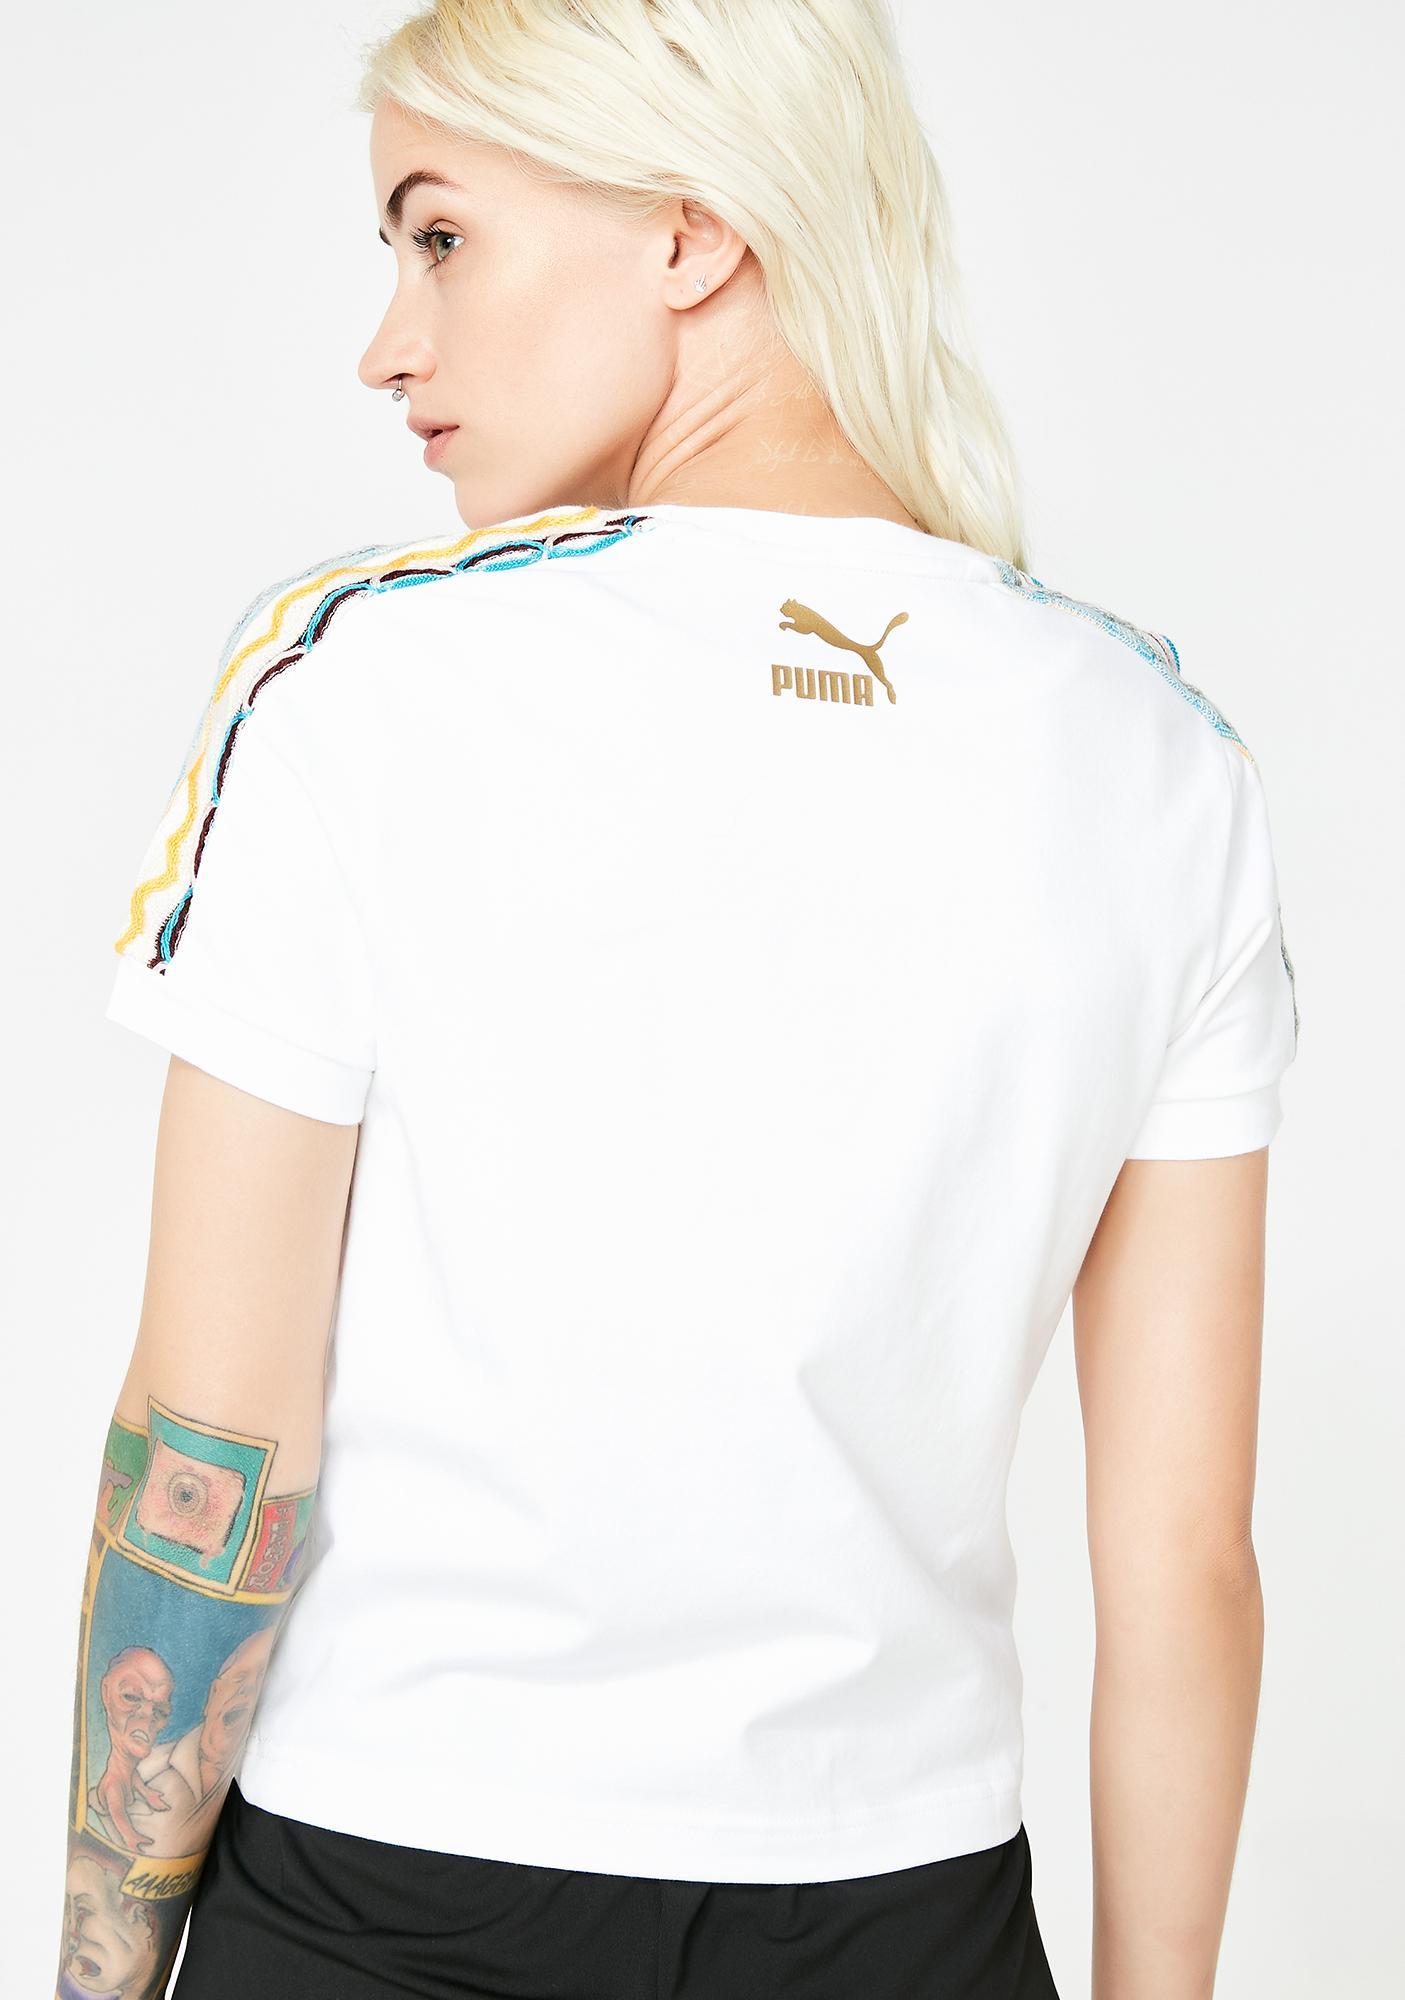 PUMA X Coogi T7 Archive T-shirt